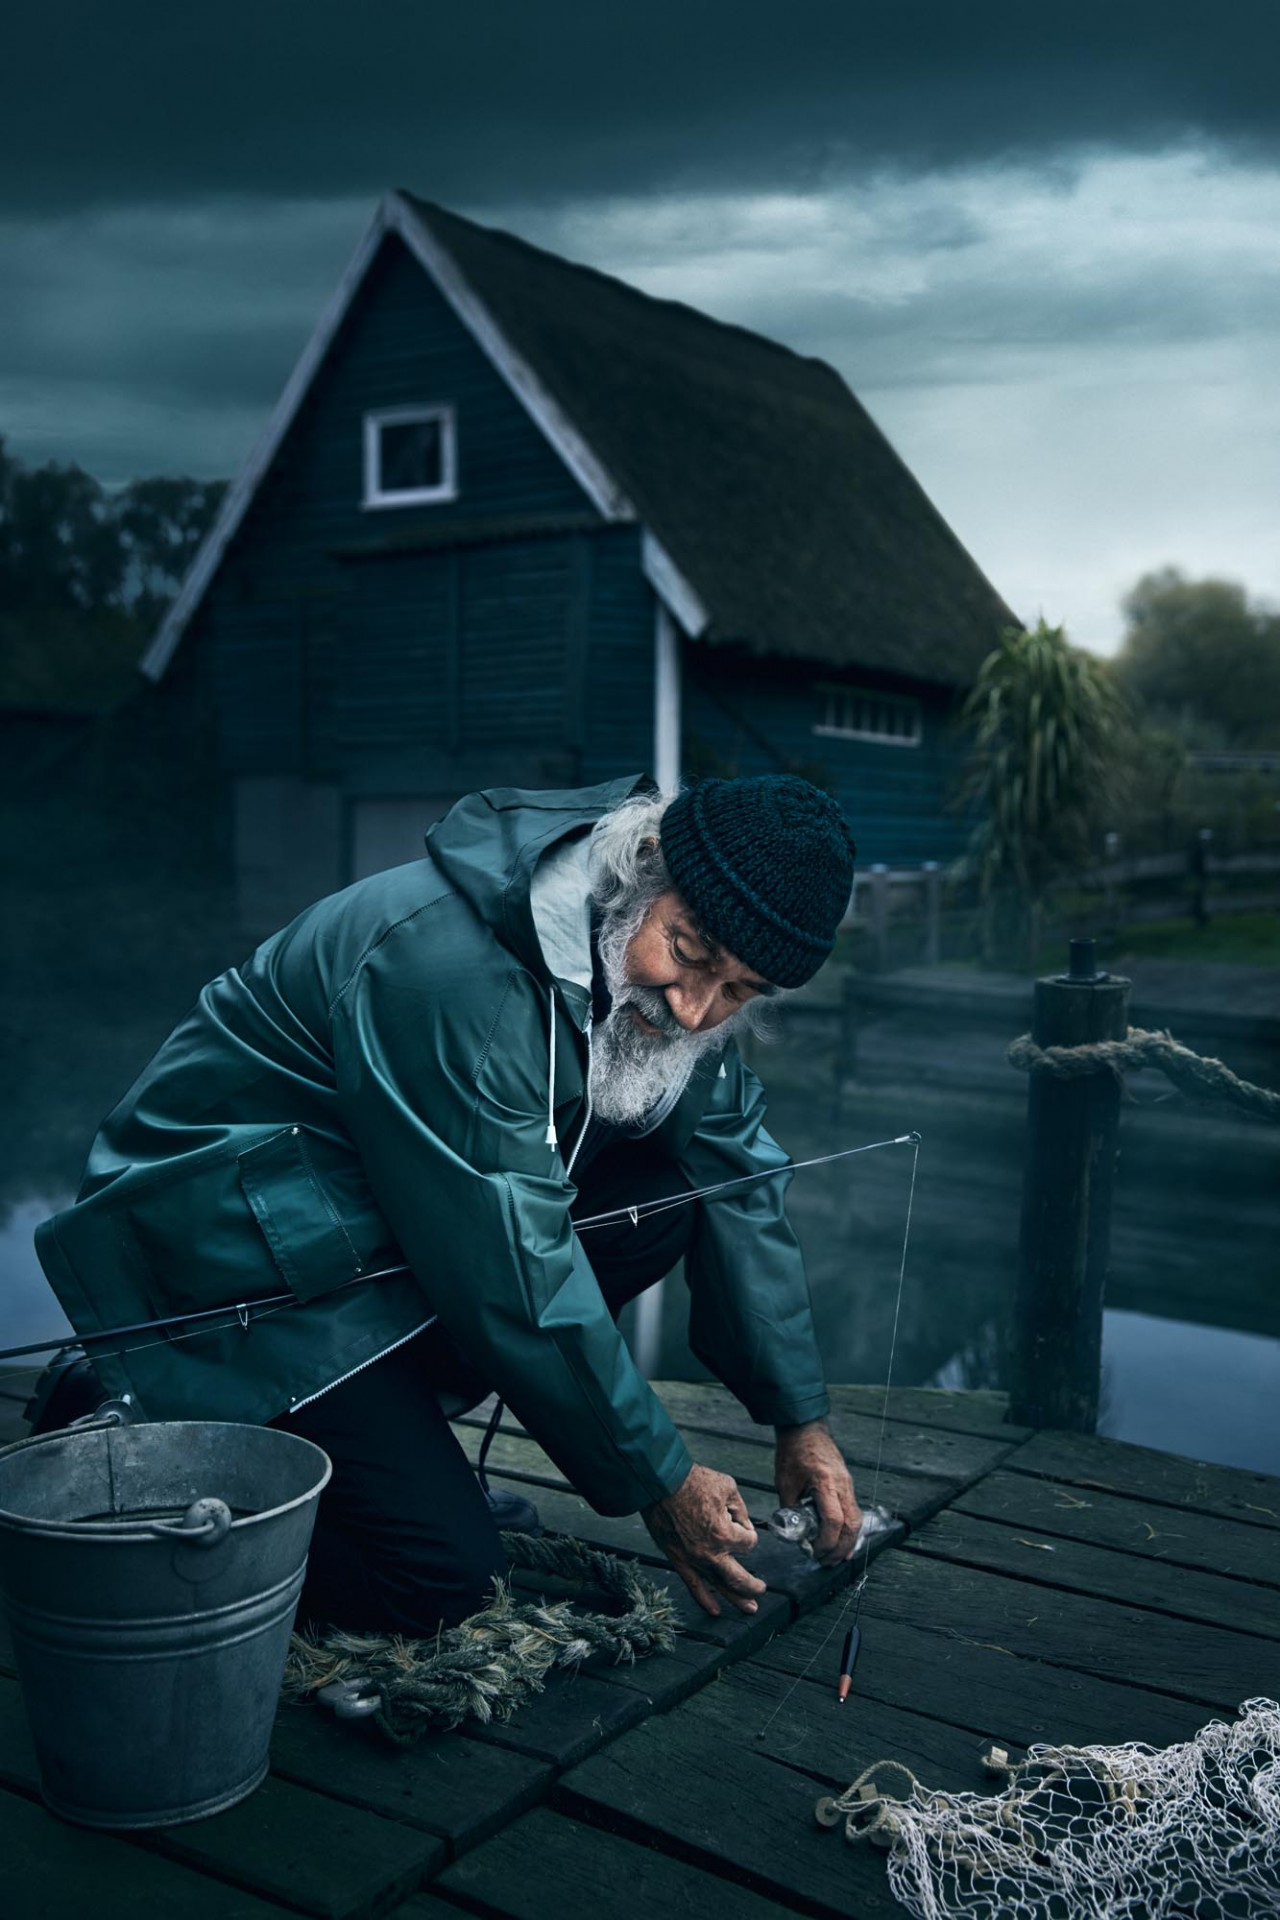 JULES ESICK FISHERMAN